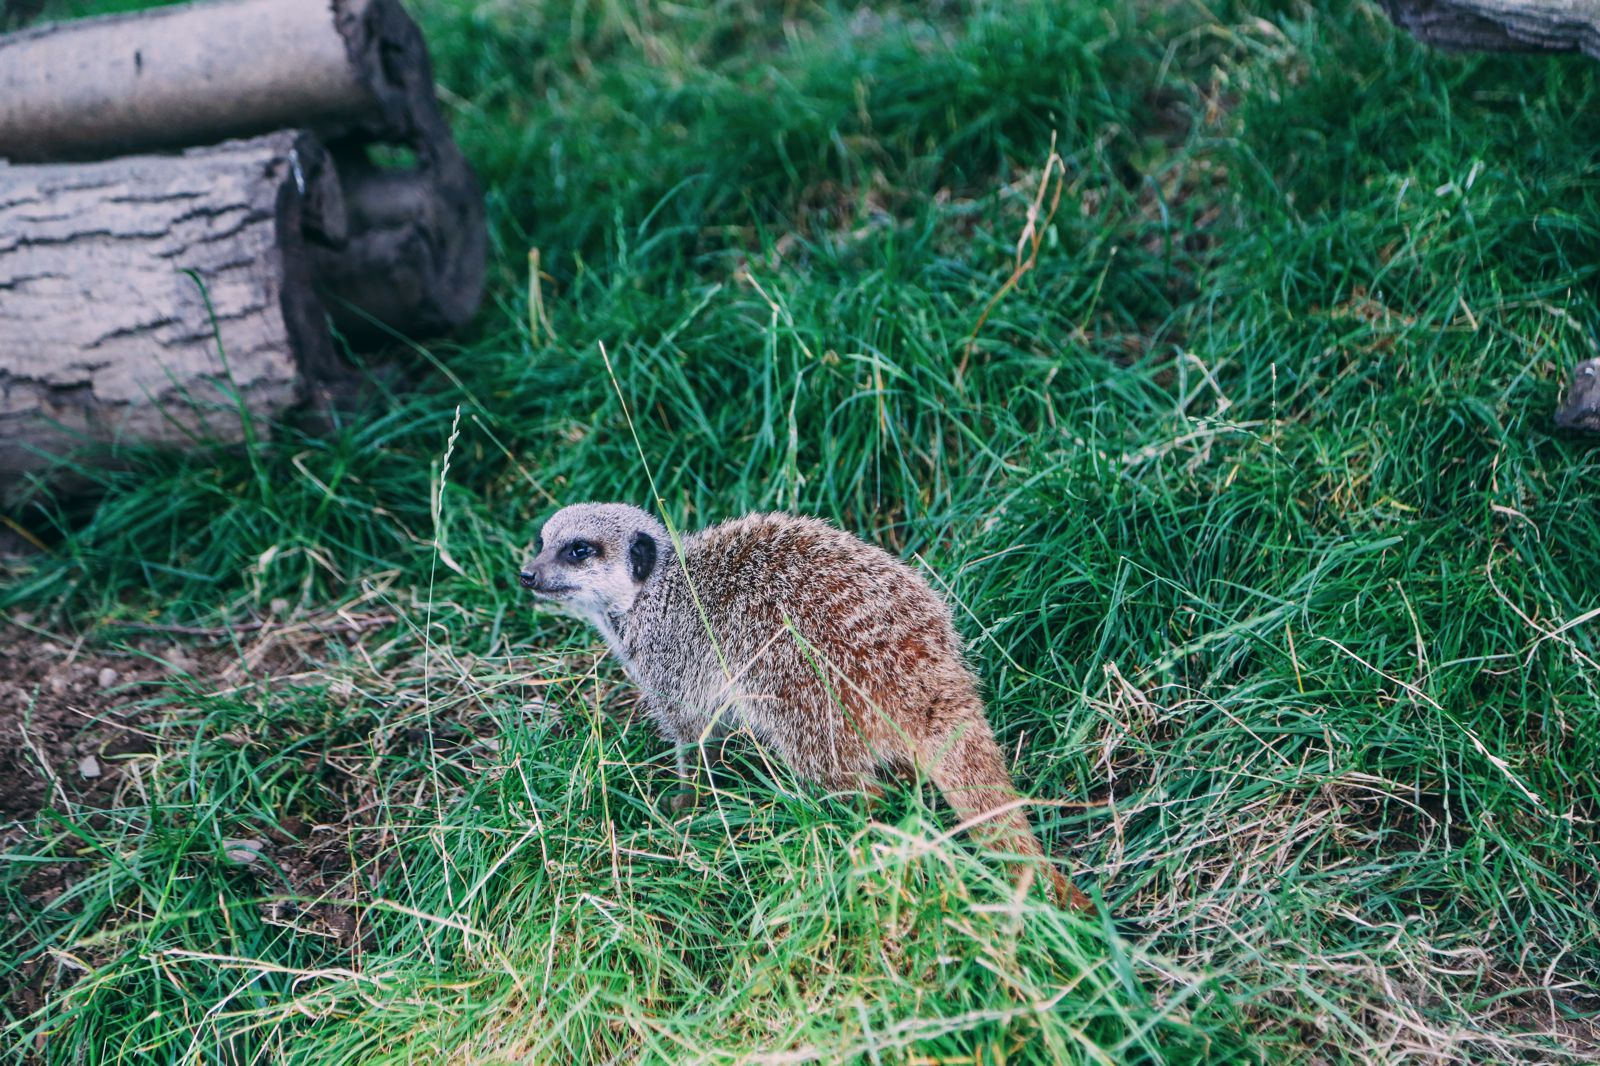 Safari In Scotland - The Photo Diary at Blair Drummond Safari and Adventure Park (17)